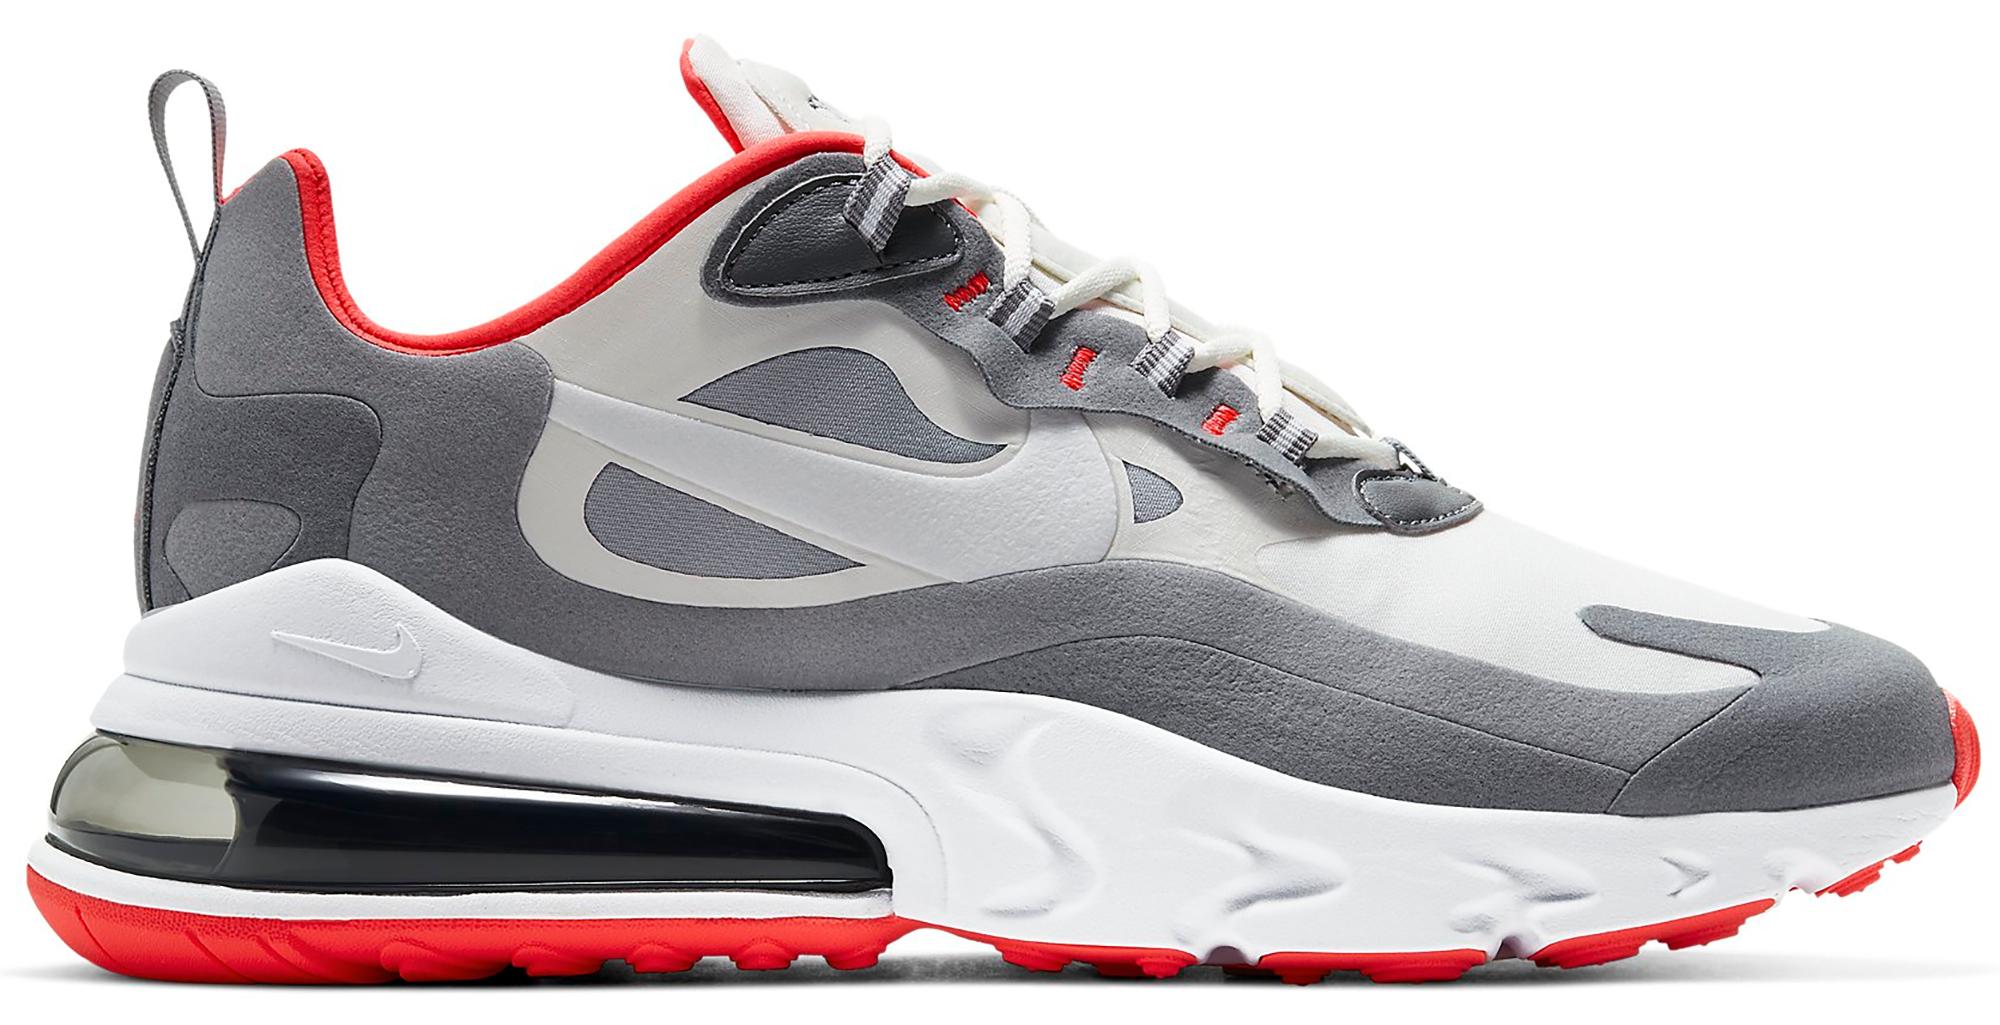 Nike Air Max 270 React Smoke Grey Red